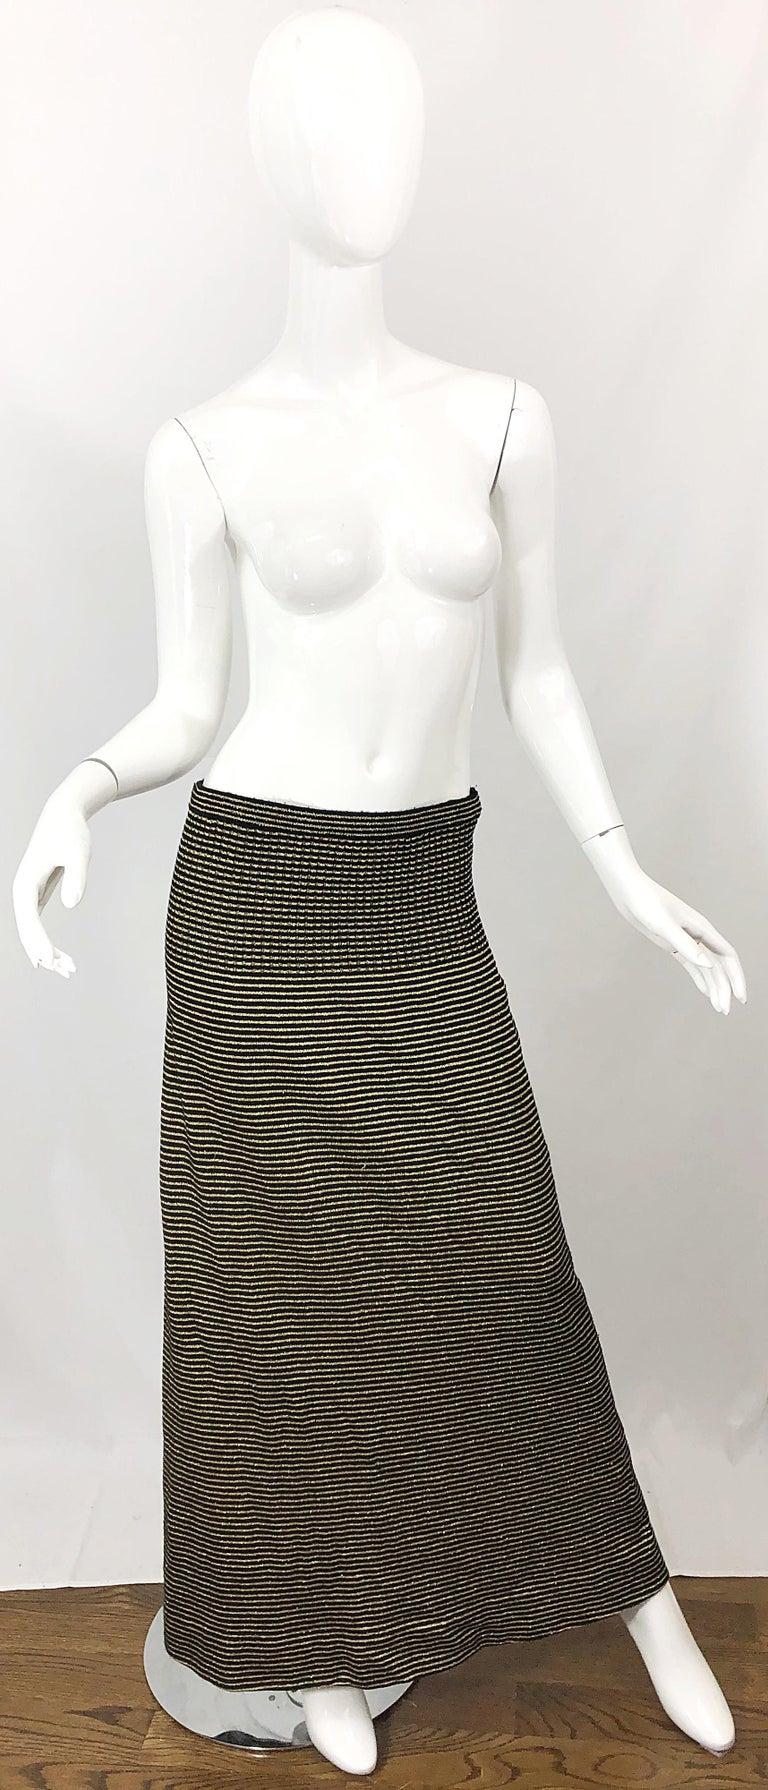 Vintage Yves Saint Laurent YSL 70s Gold Black Strapless Knit Dress or Maxi Skirt For Sale 1